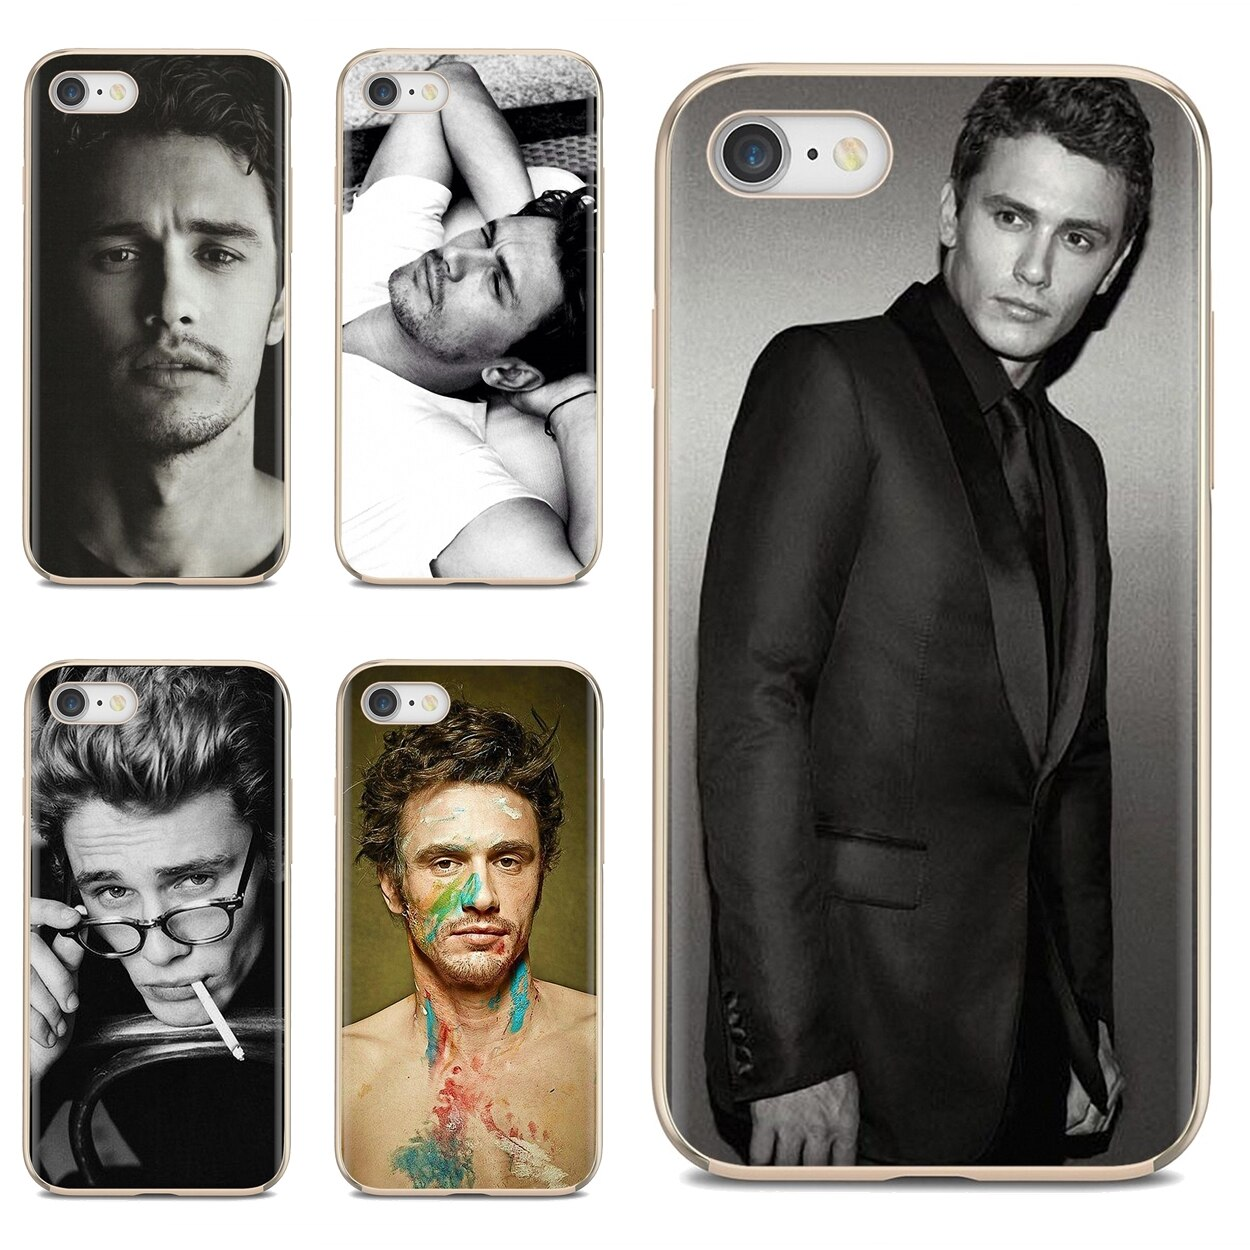 Suave cubierta TPU para iPod Touch para iPhone 11 Pro 4 4S 5 5S SE 5C 6 6S 7 7 8 X XR XS Plus Max James Franco malo pose americano